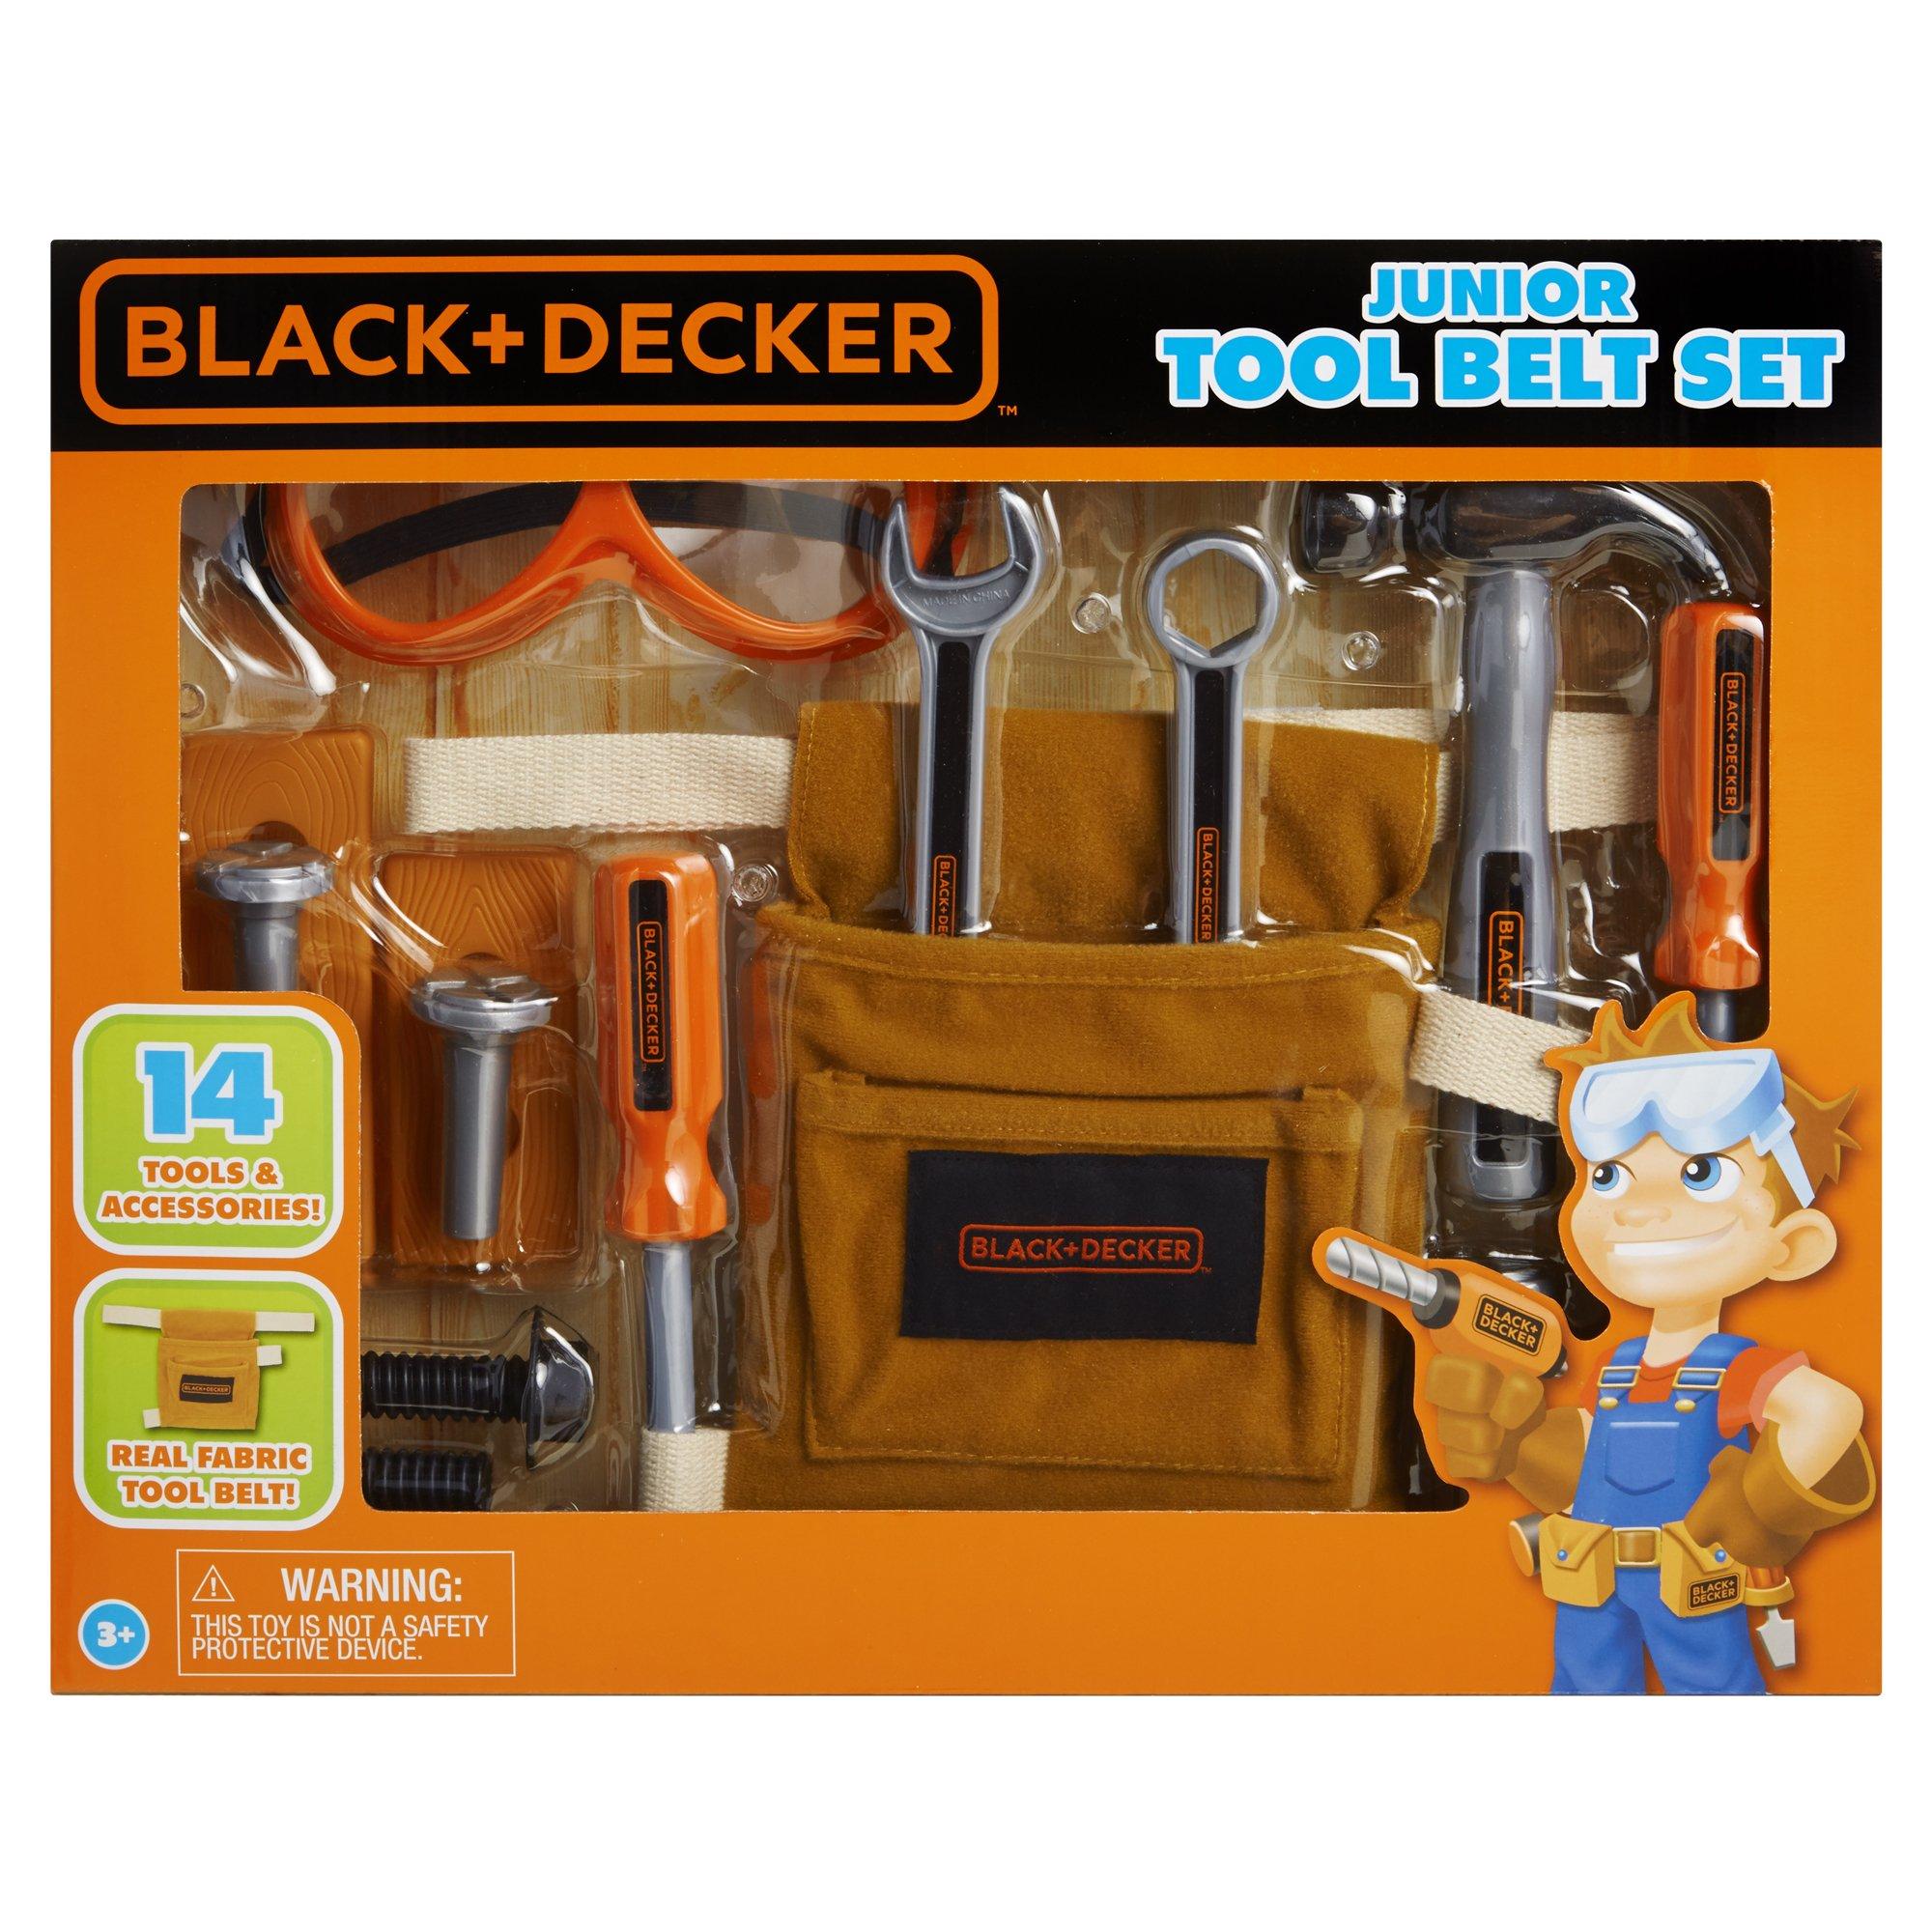 Black & Decker Junior 14 Piece Toy Tool Belt Set by Jakk Pacific